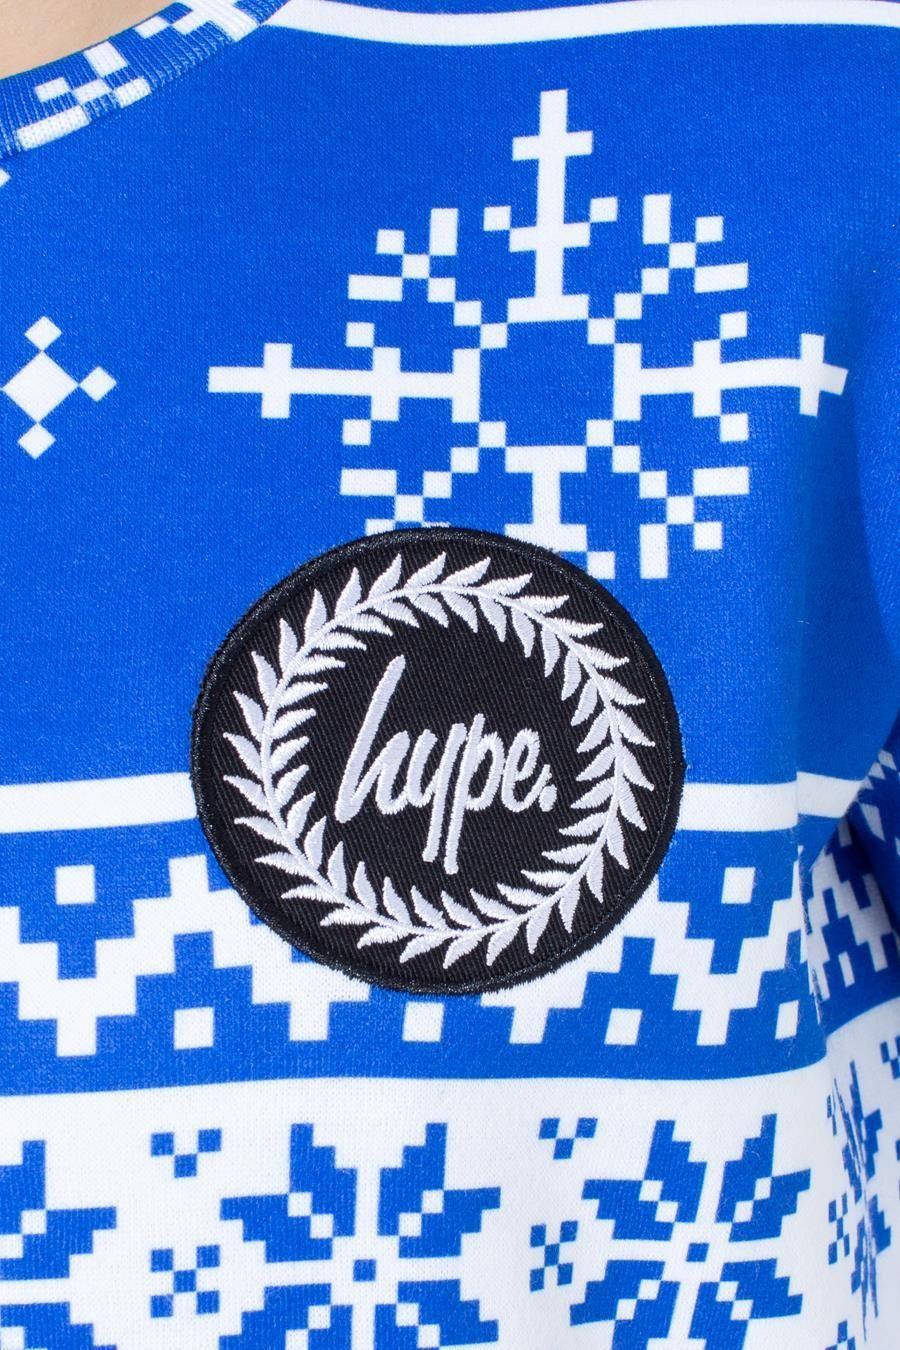 Hype Blue Fairisle Kids Crewneck